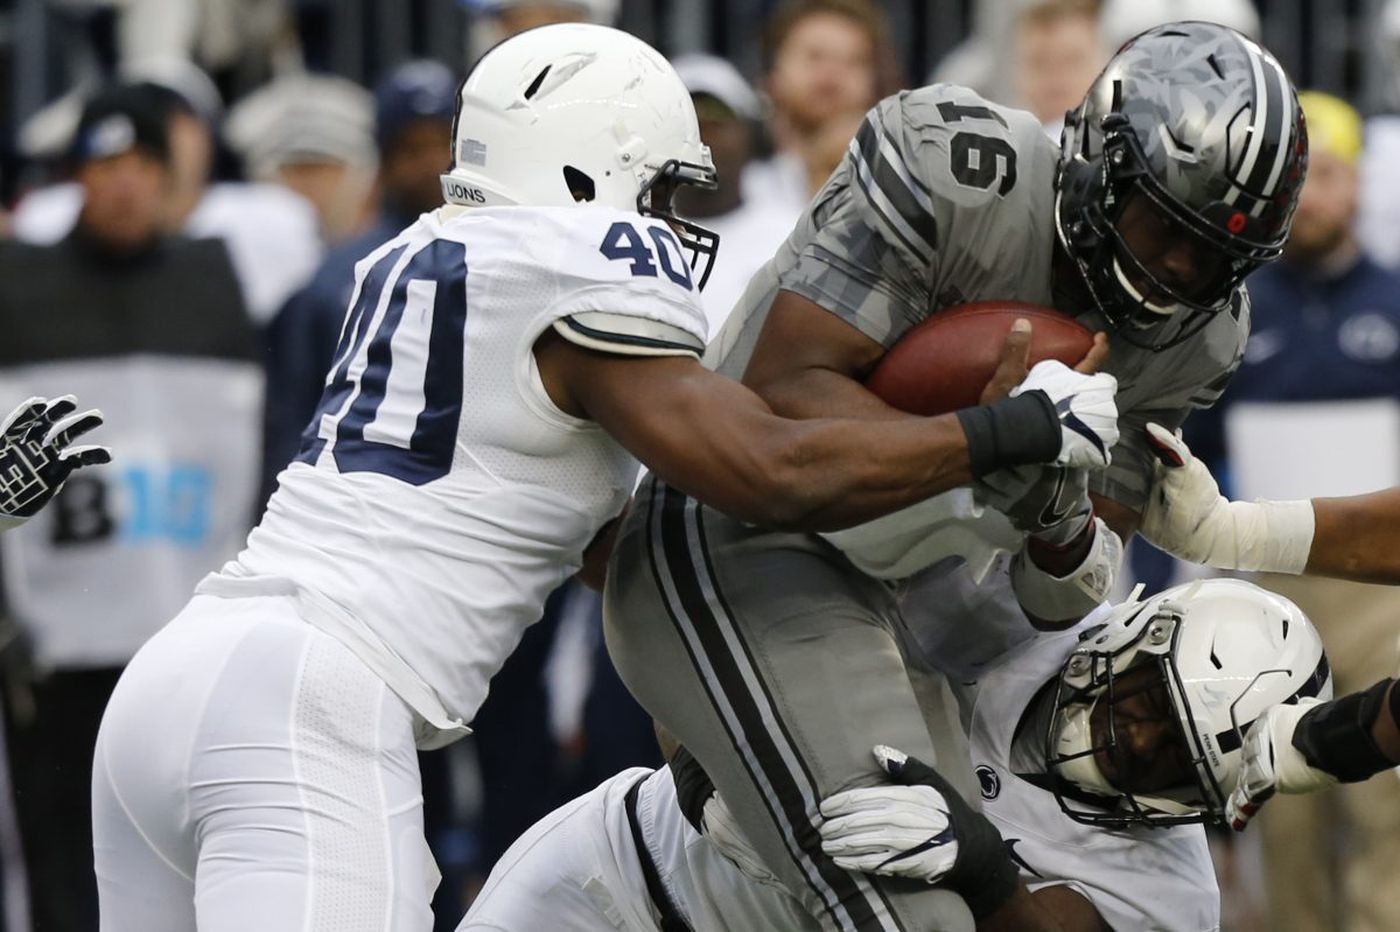 Penn State's still confident, Jason Cabinda says